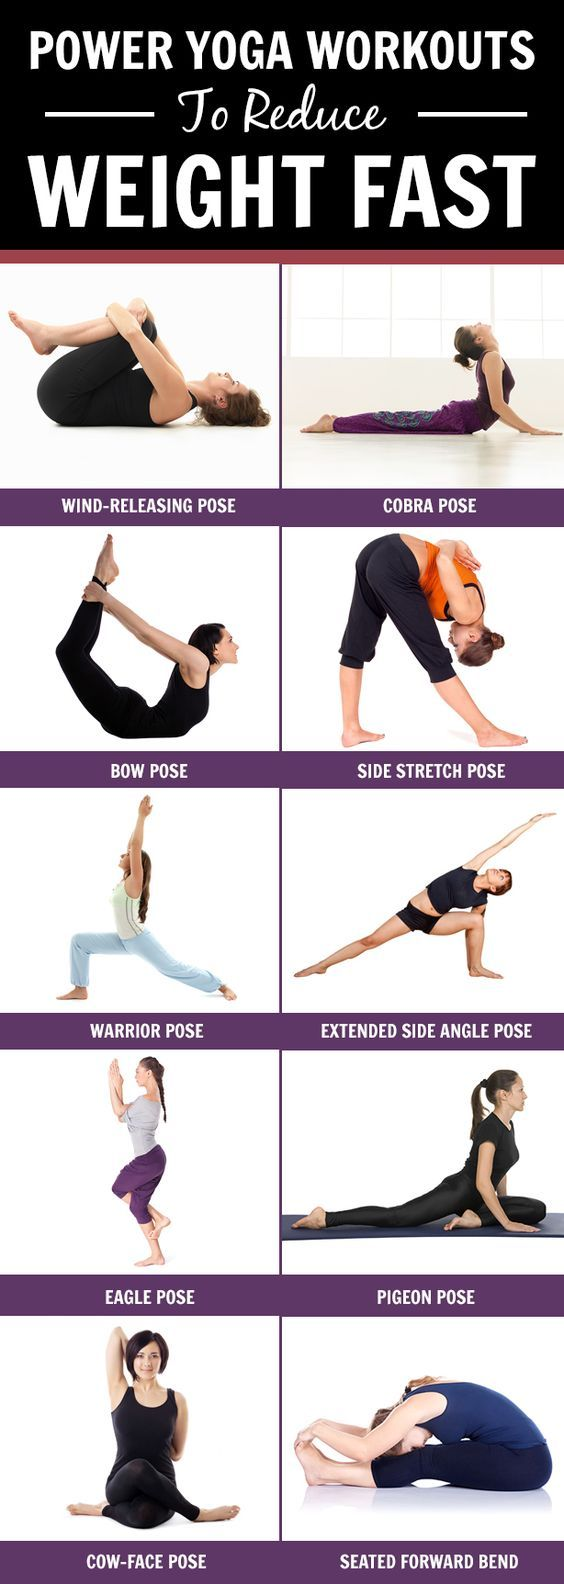 Best Weight Loss Yoga Ideas On Pinterest Yoga For Weight - Best yoga posesasanas for quick weight loss